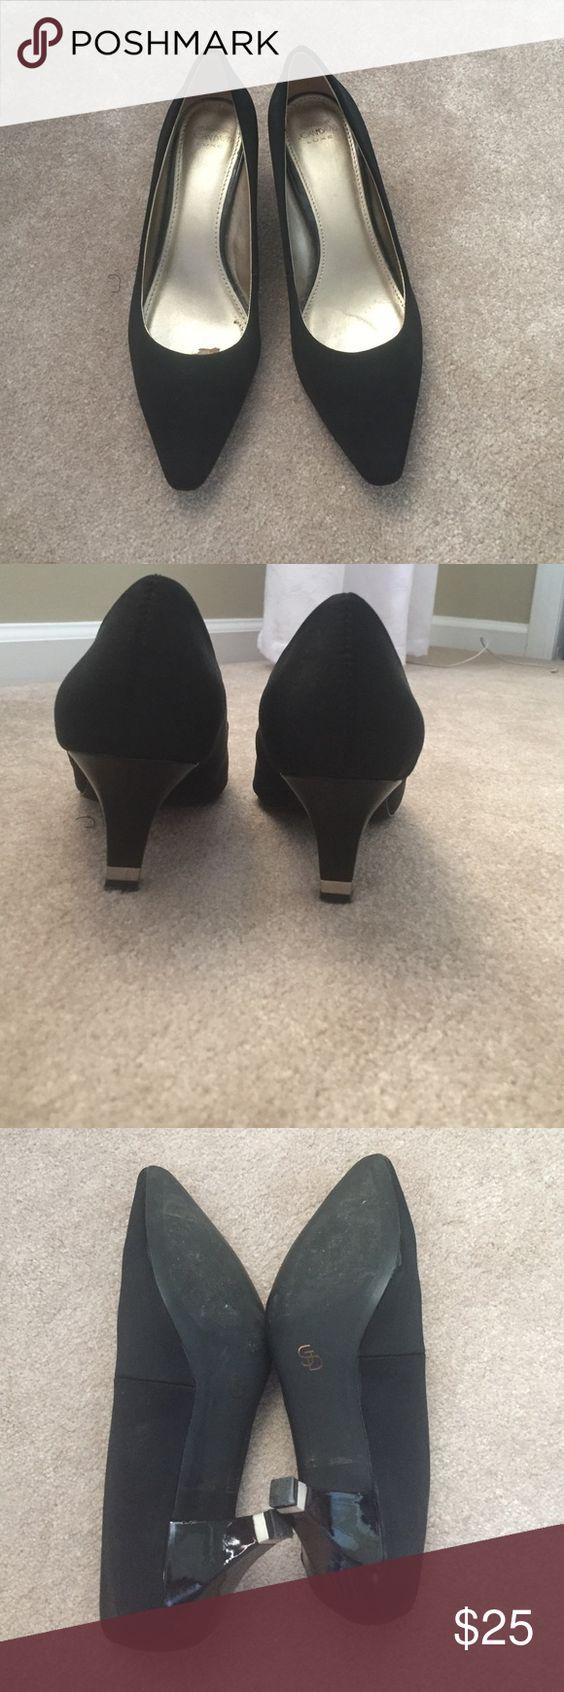 Black Nylon Heels Black nylon heels in great condition! 3 inch heel. Only worn twice. Joan & David Shoes Heels